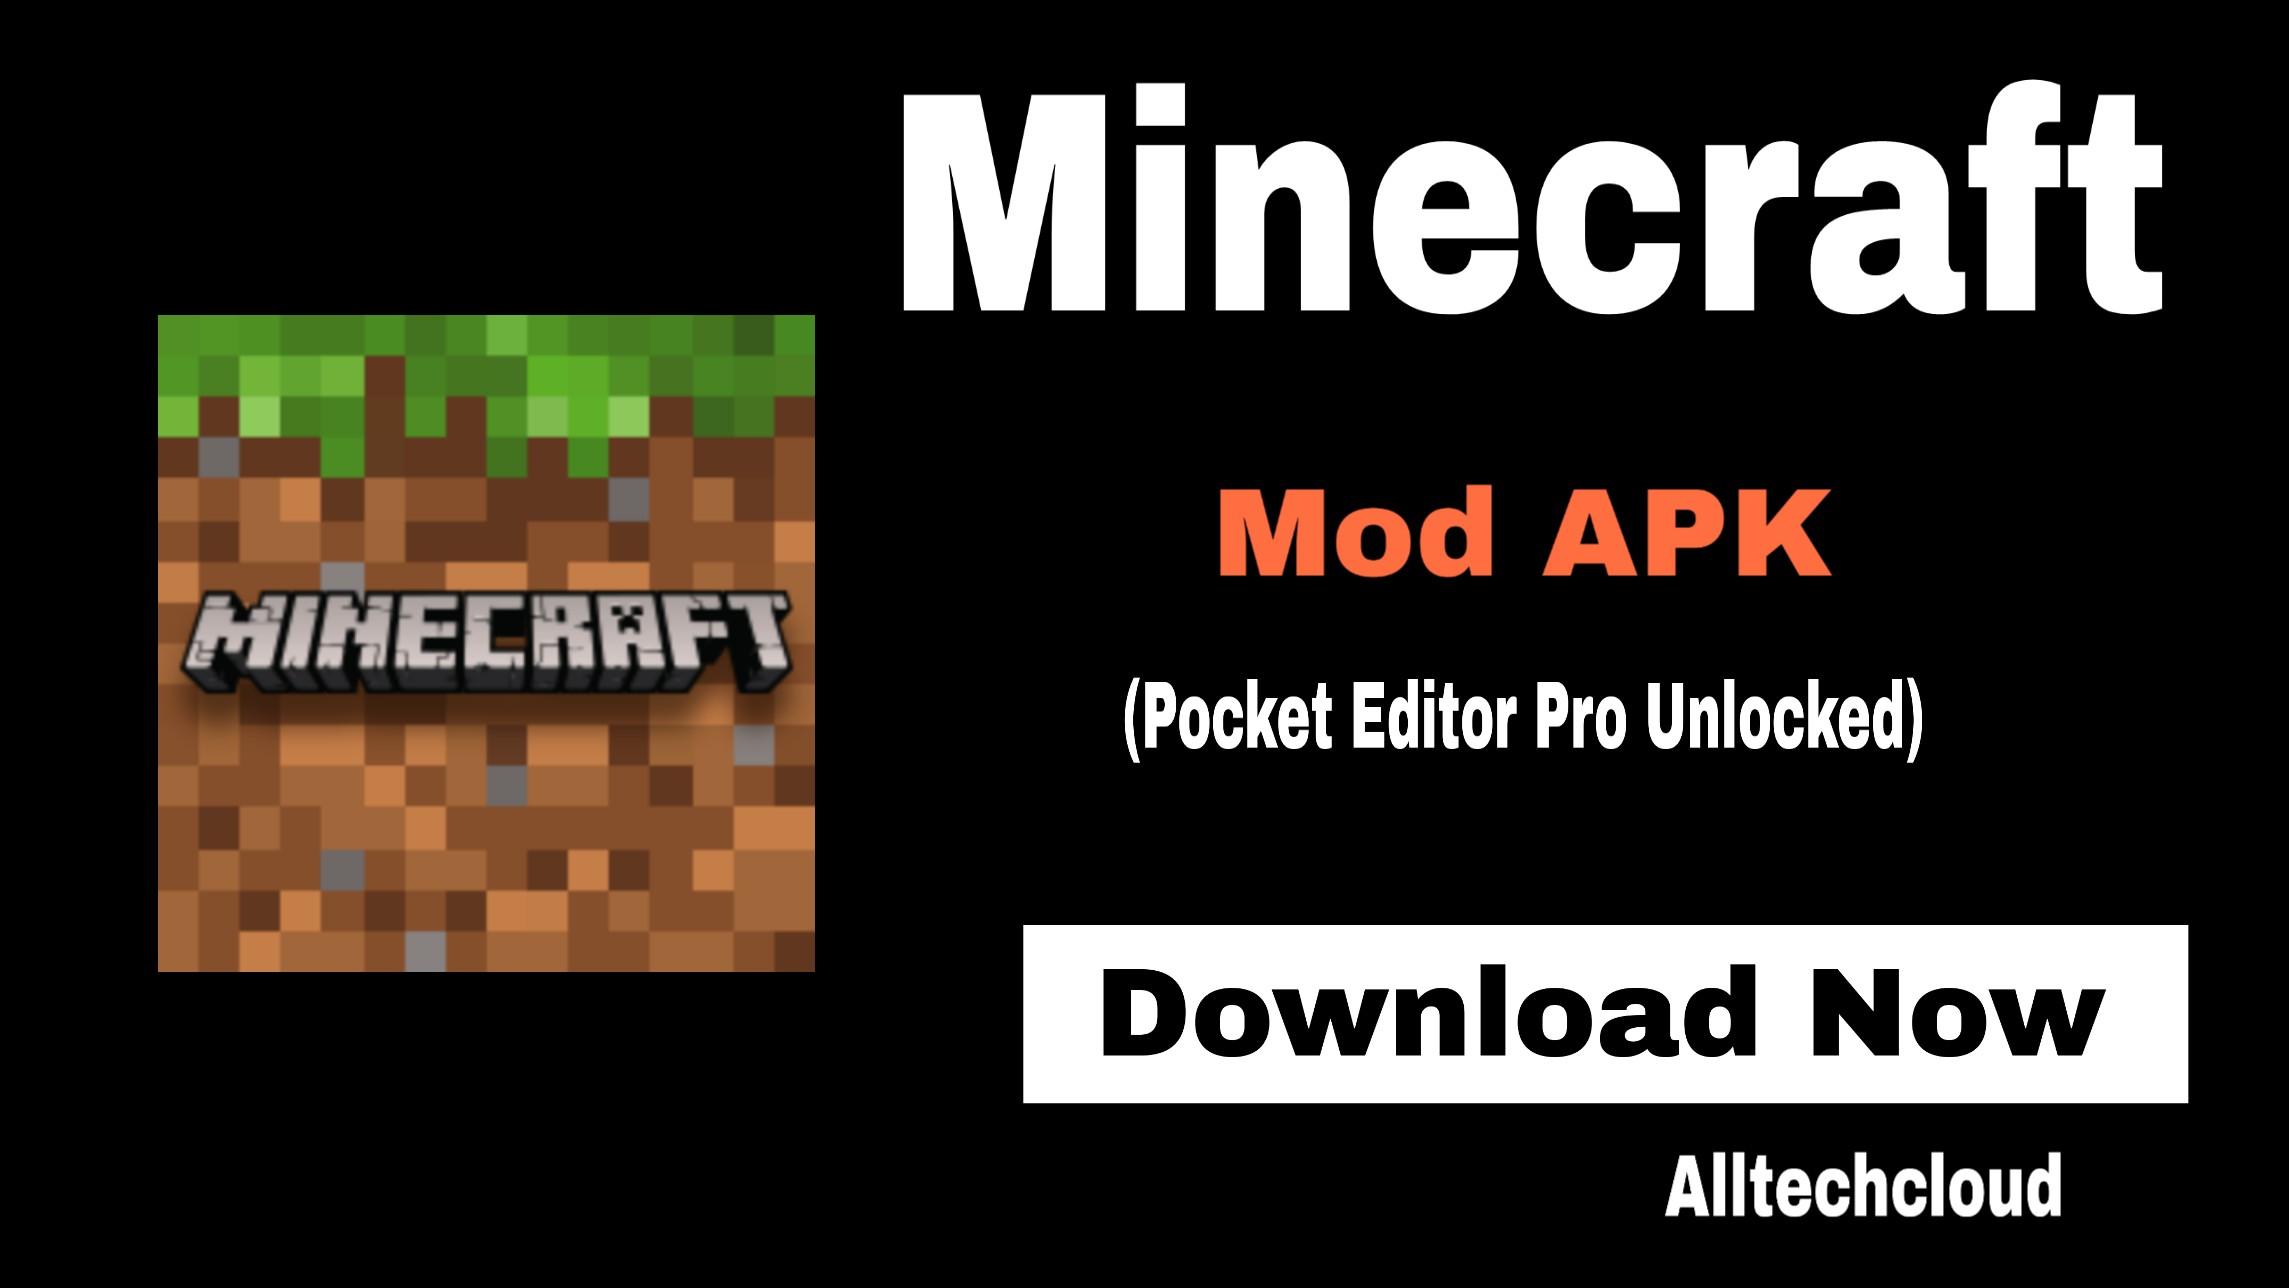 Minecraft Mod APK v1.17.20.21 Download (Premium Unlocked) 2021